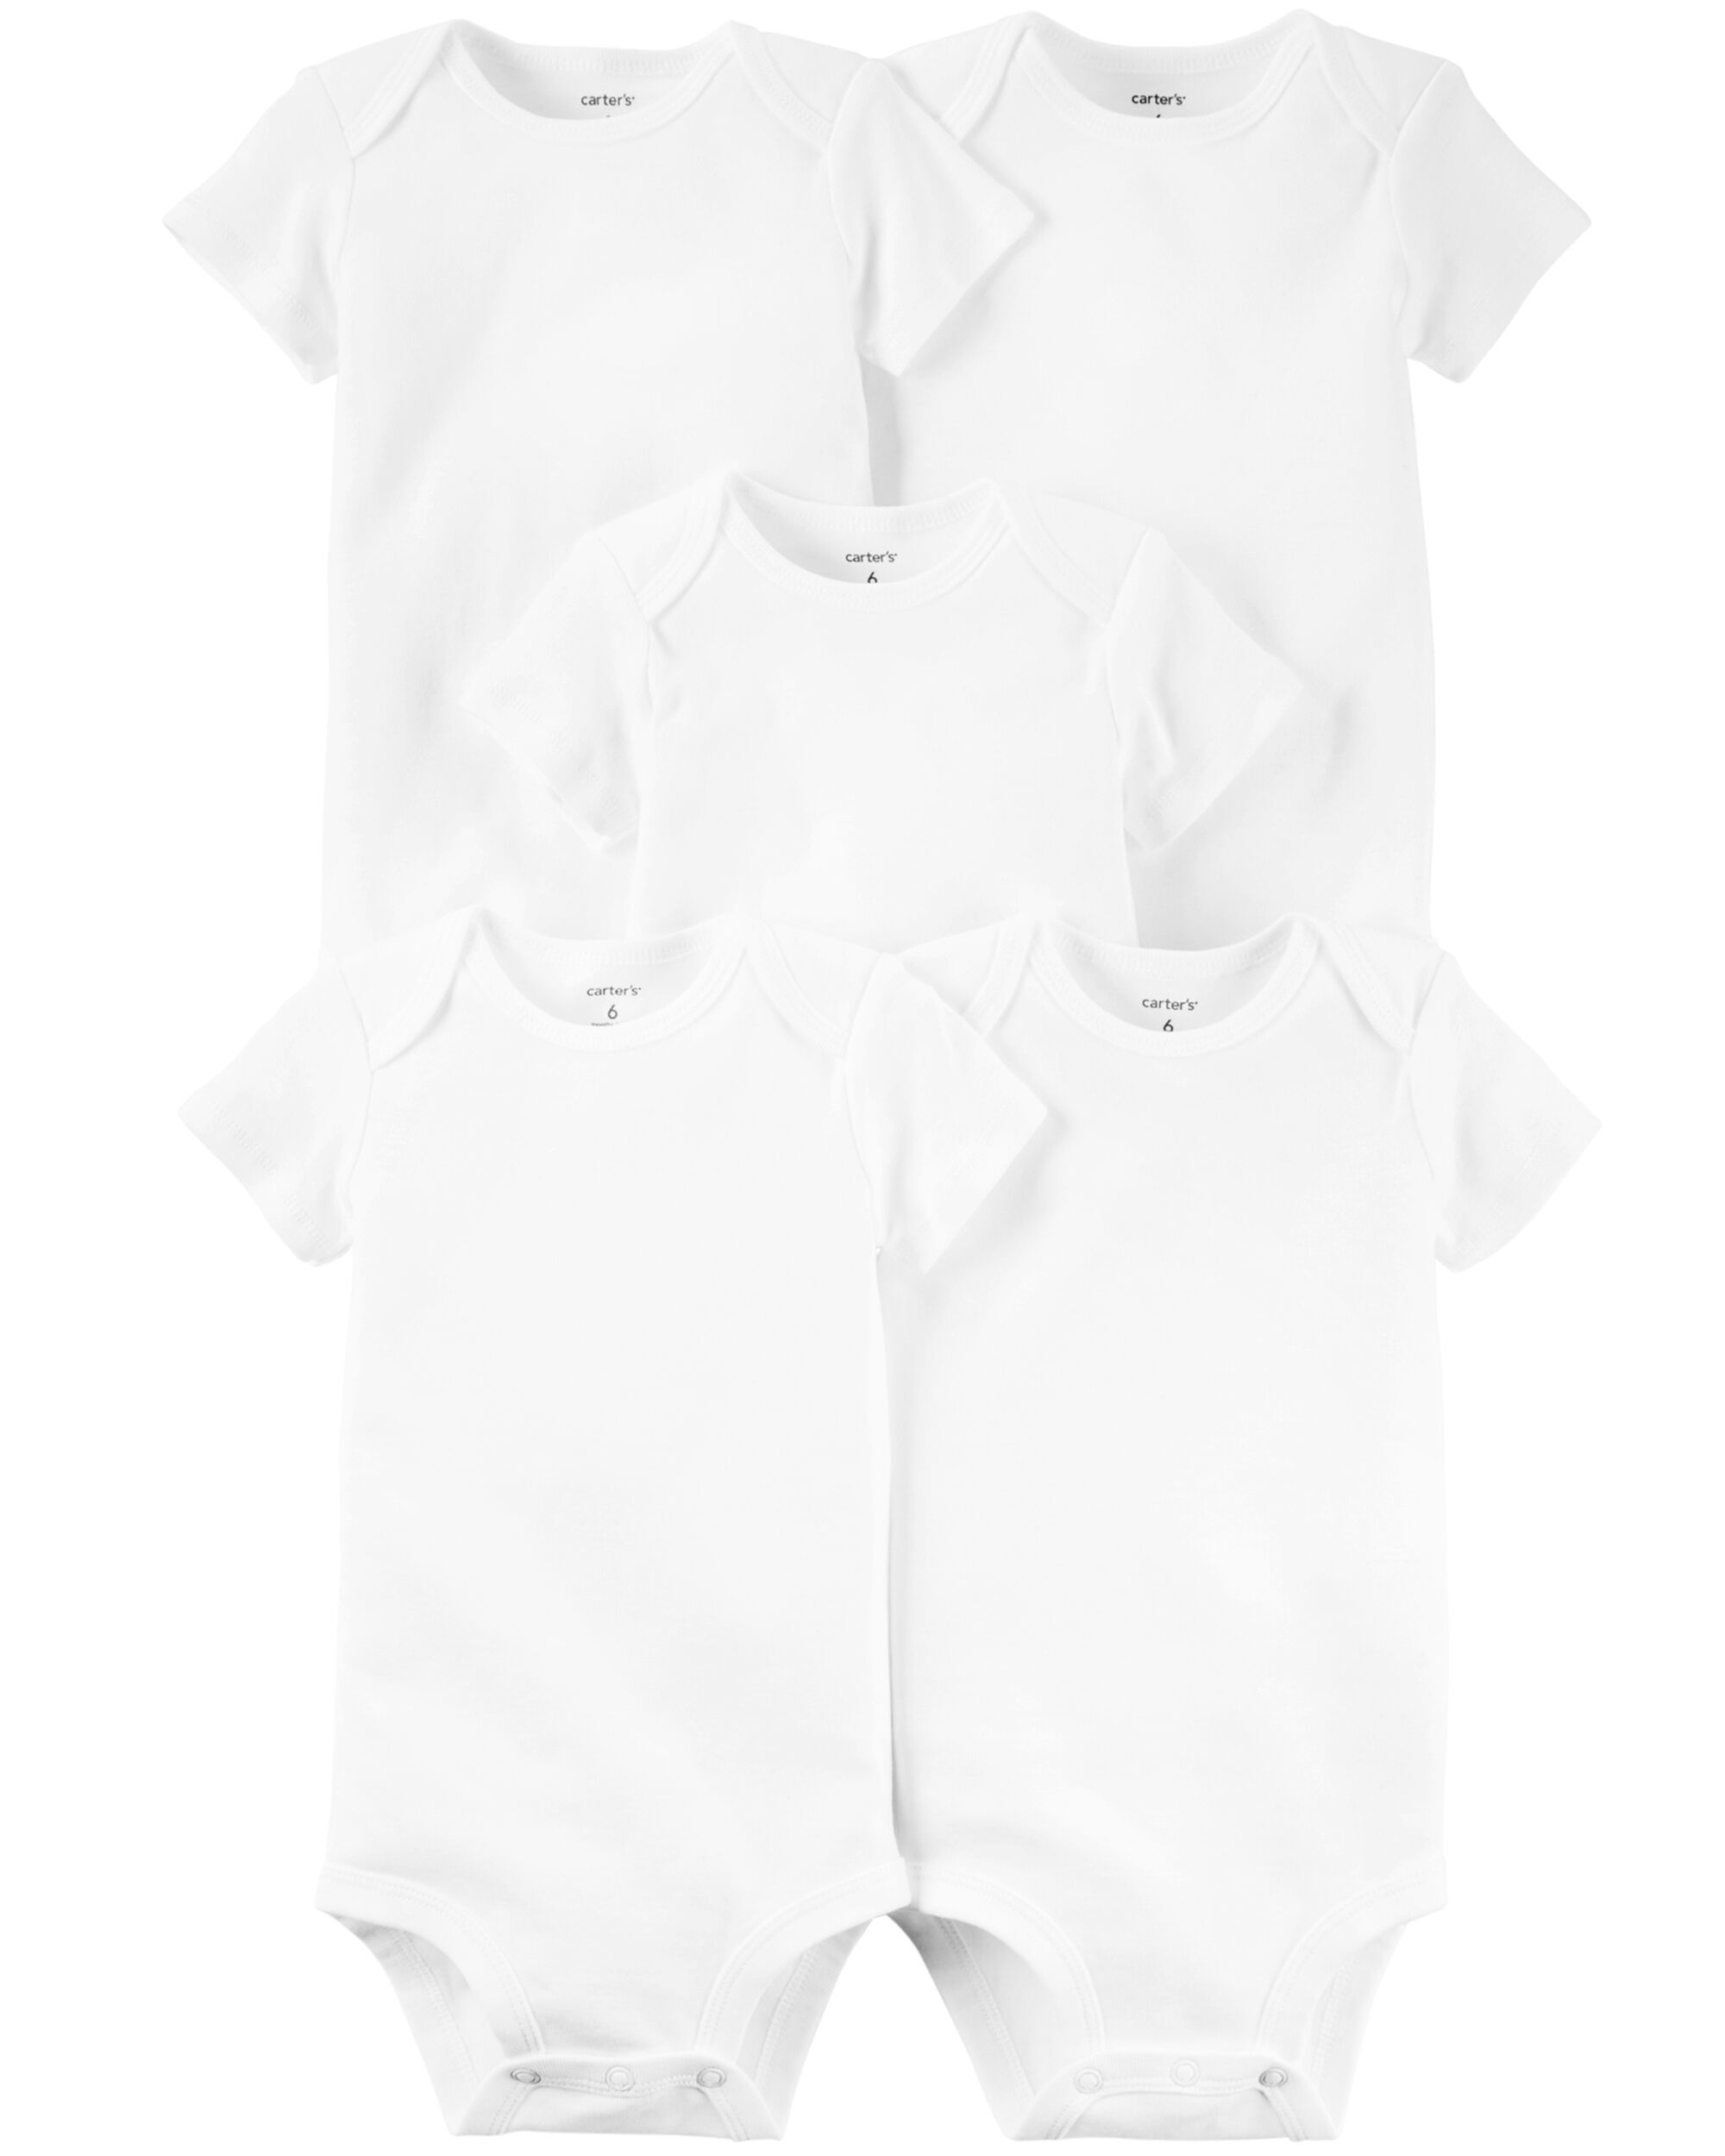 Carters 5-Pack Short-Sleeve Original Bodysuits